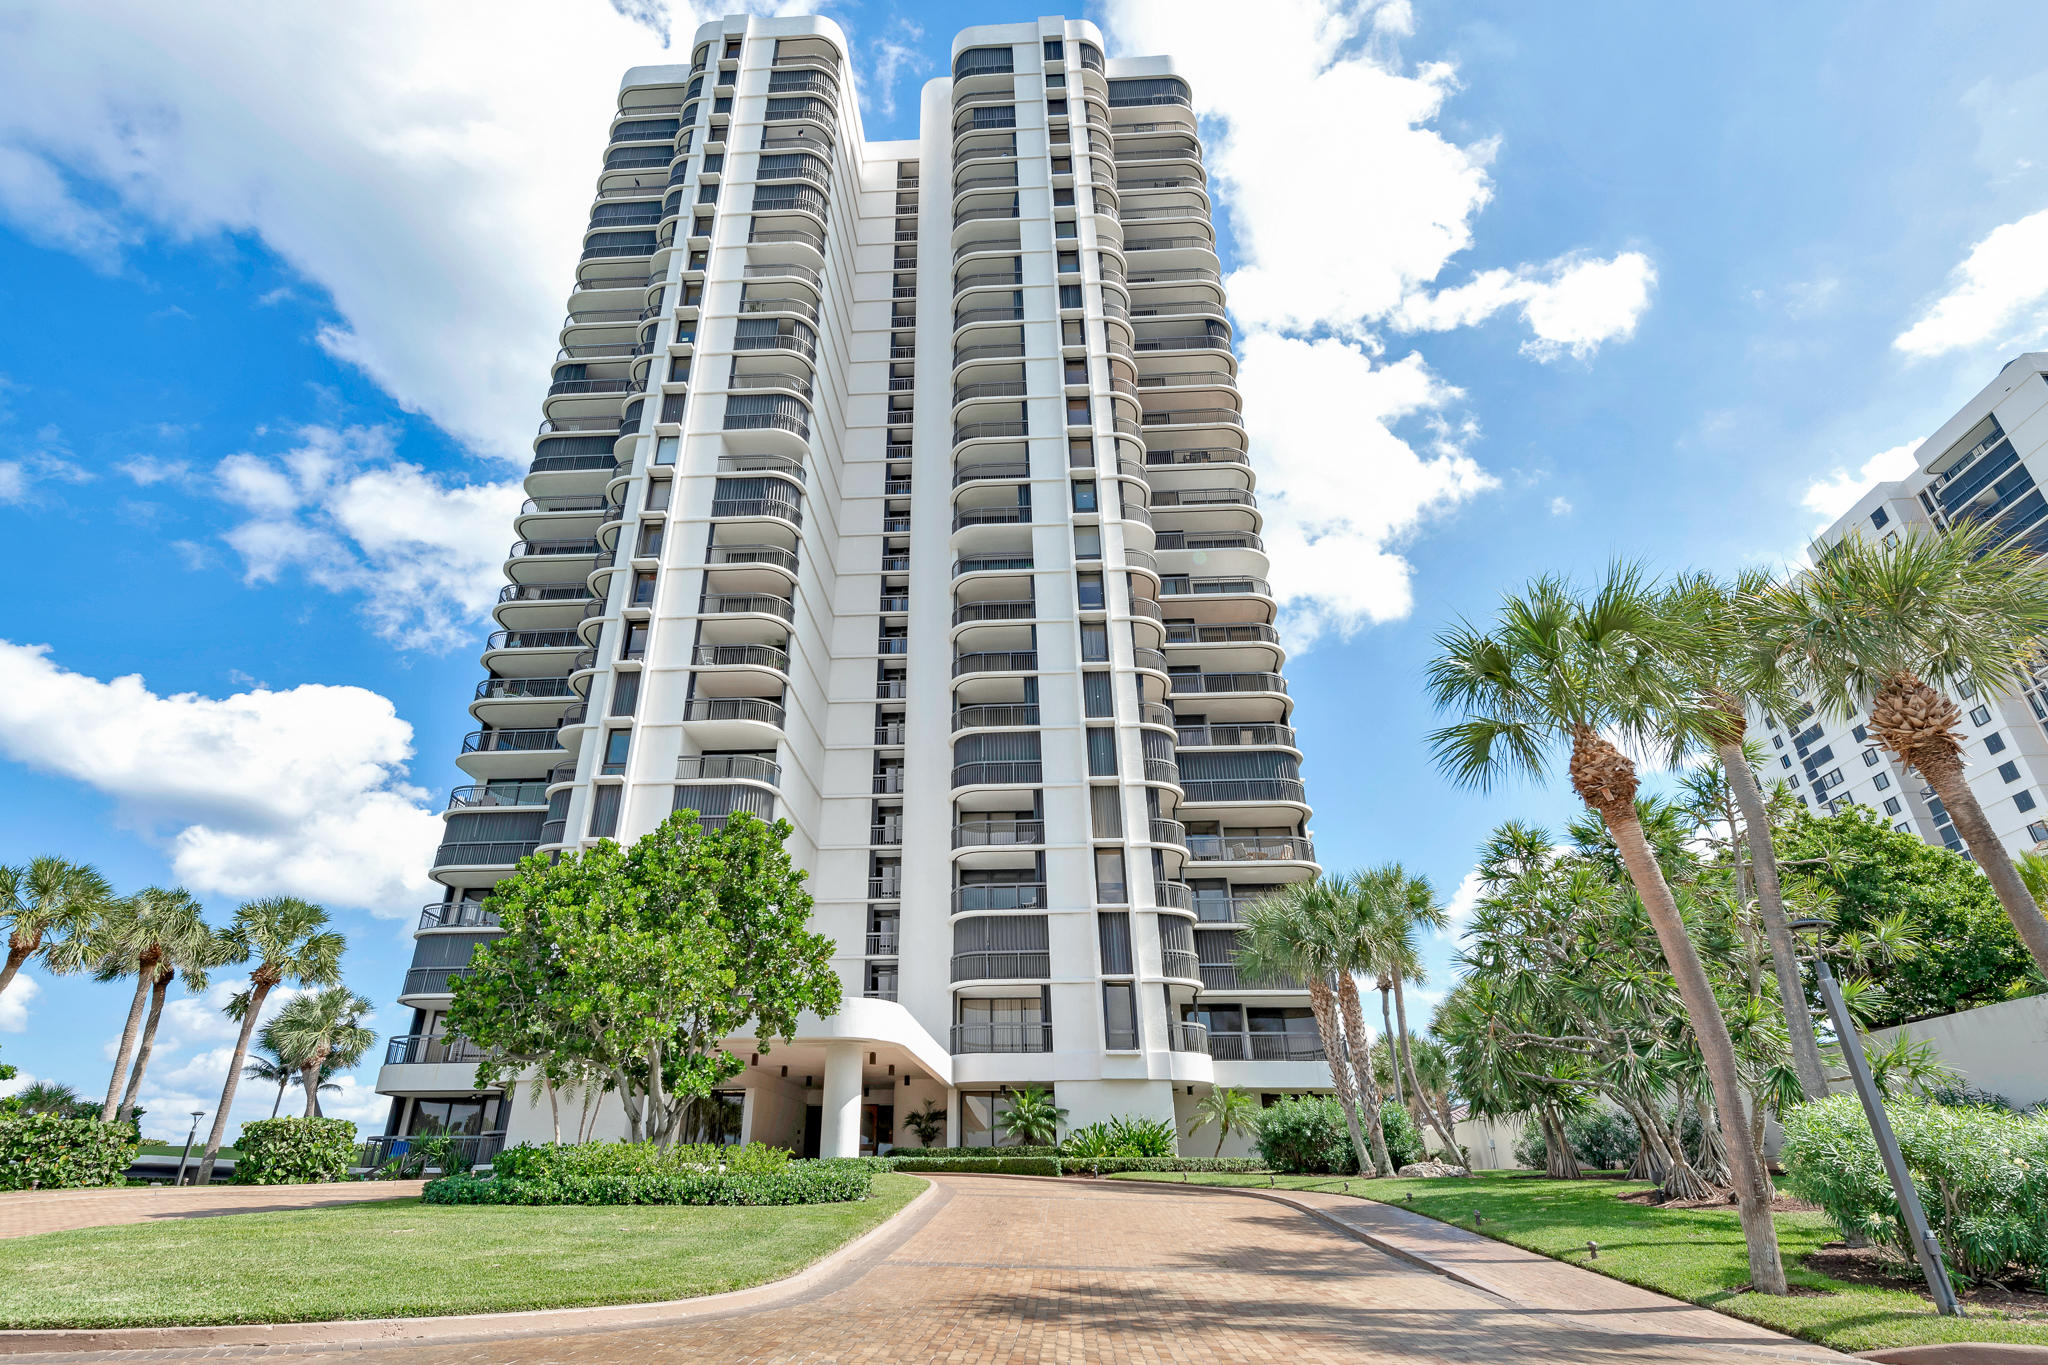 5380 Ocean Drive 6j, Riviera Beach, Florida 33404, 3 Bedrooms Bedrooms, ,3.1 BathroomsBathrooms,A,Condominium,Ocean,RX-10478866